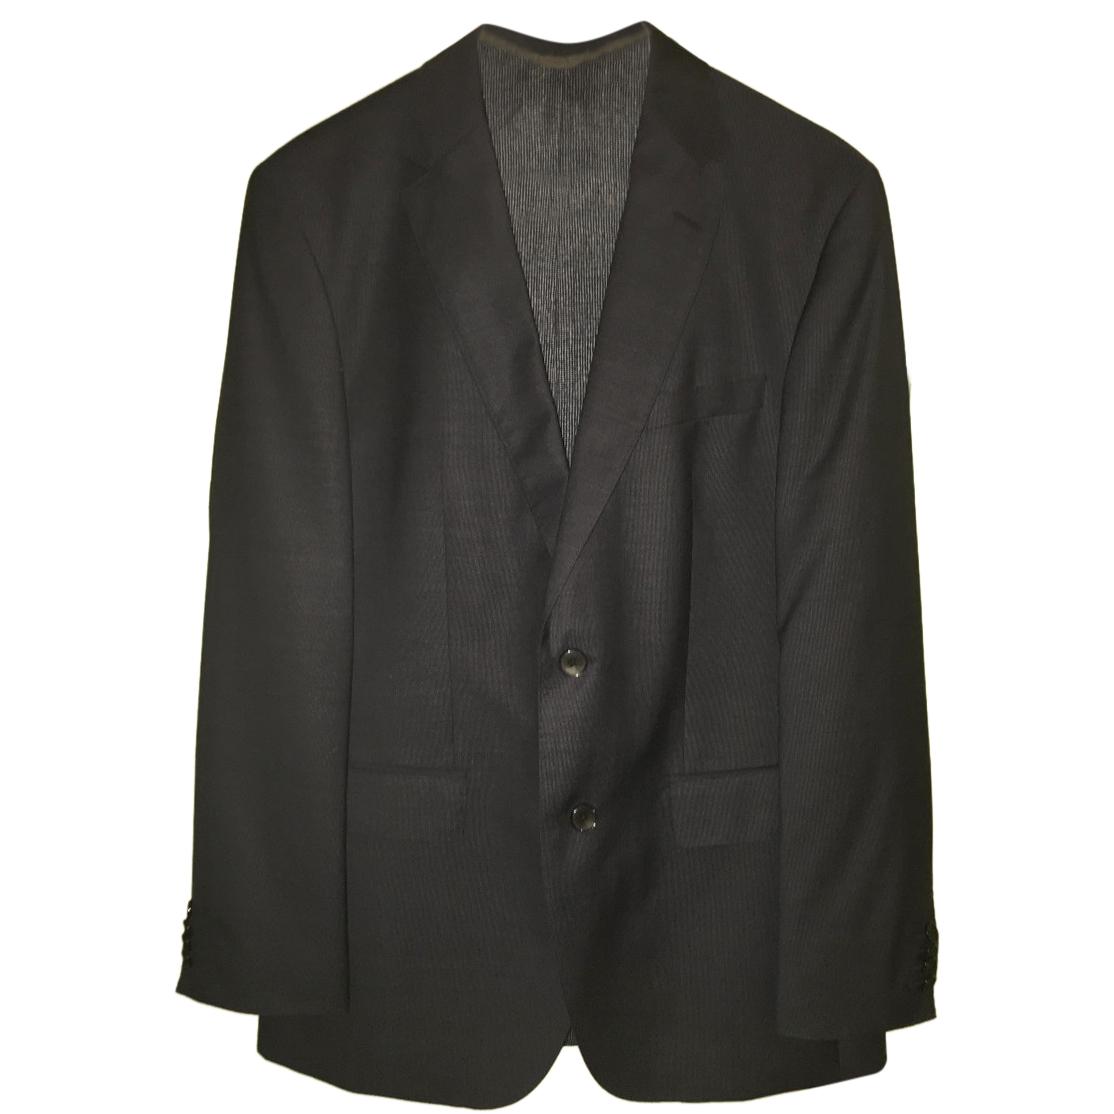 e1565cd85f Hugo Boss Mens Italian Virgin Wool Super 130 Navy Suit